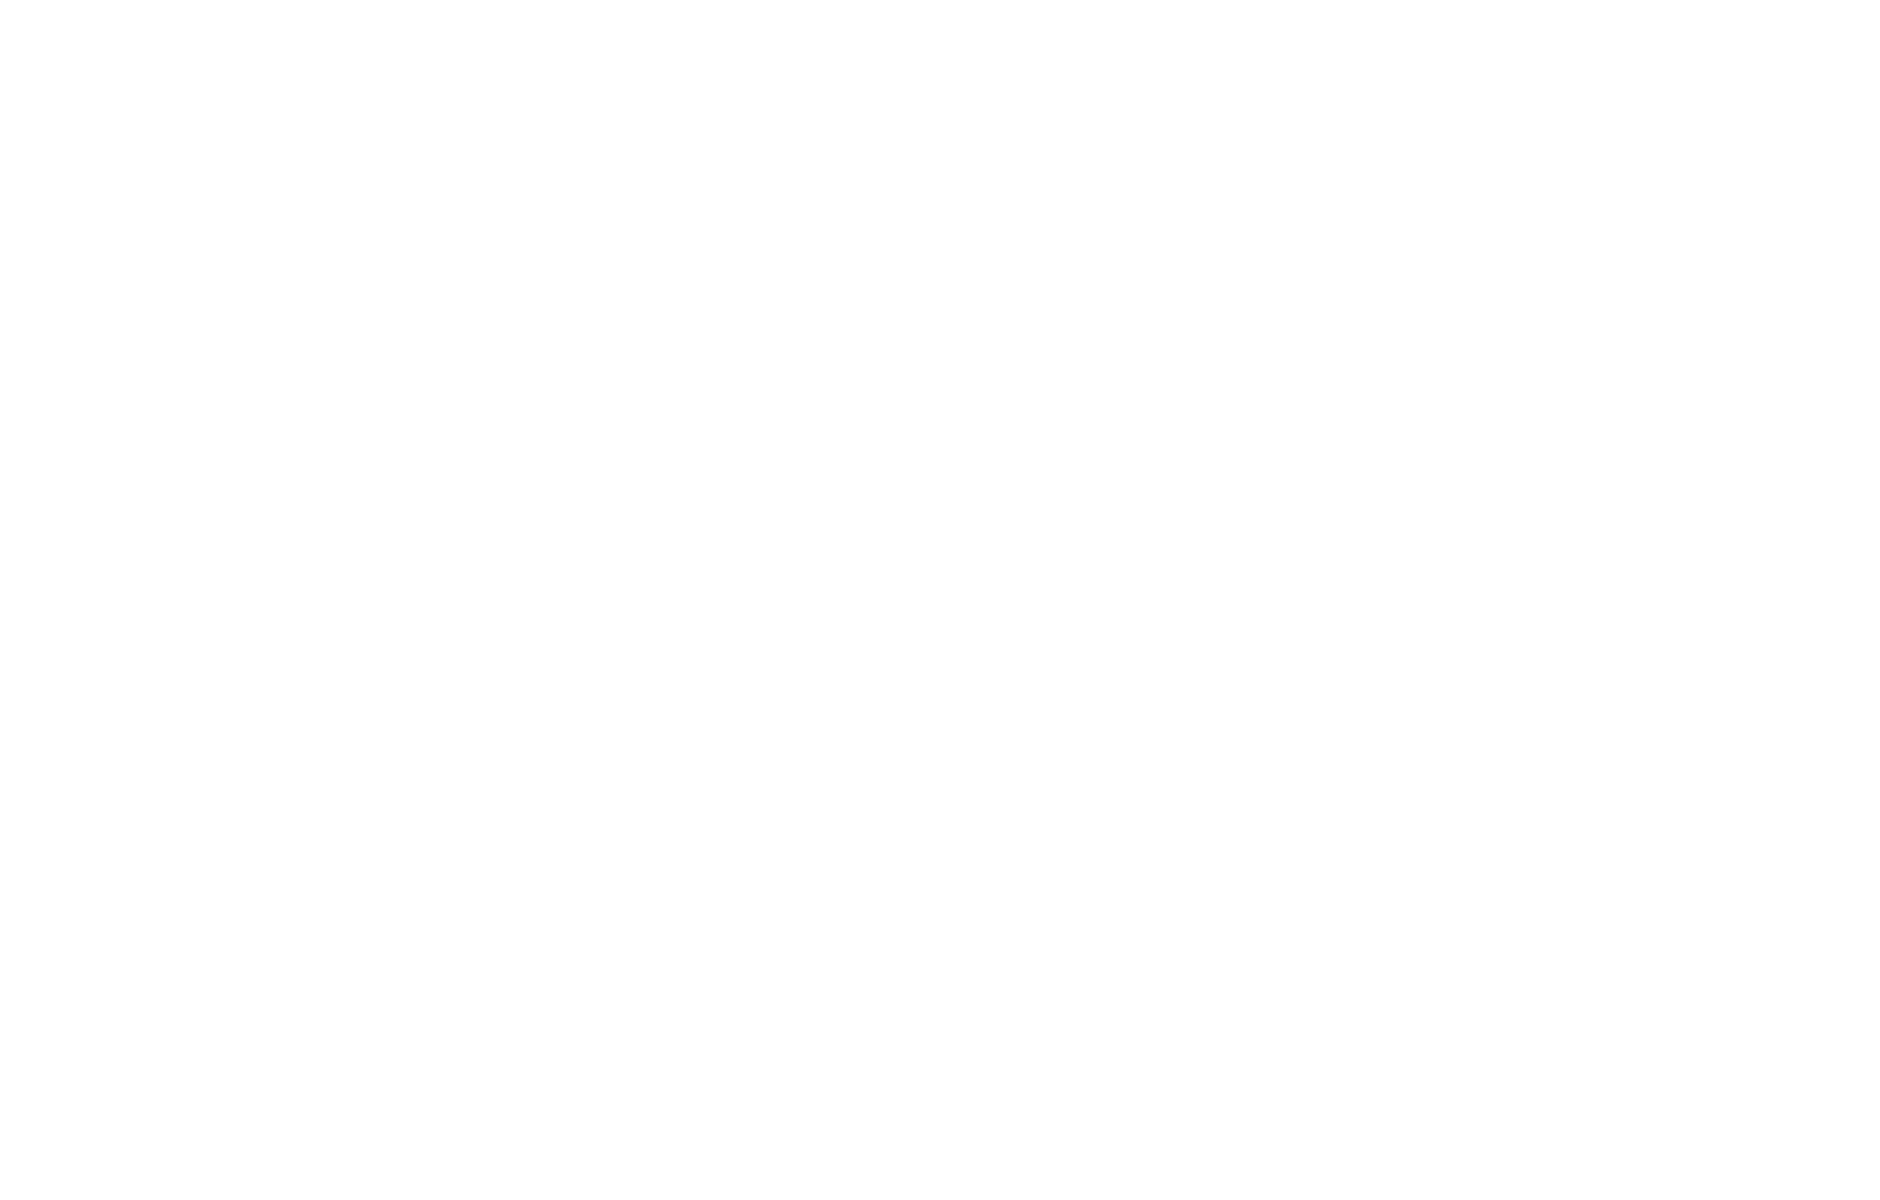 C102 cope and stick cabinet door configuration